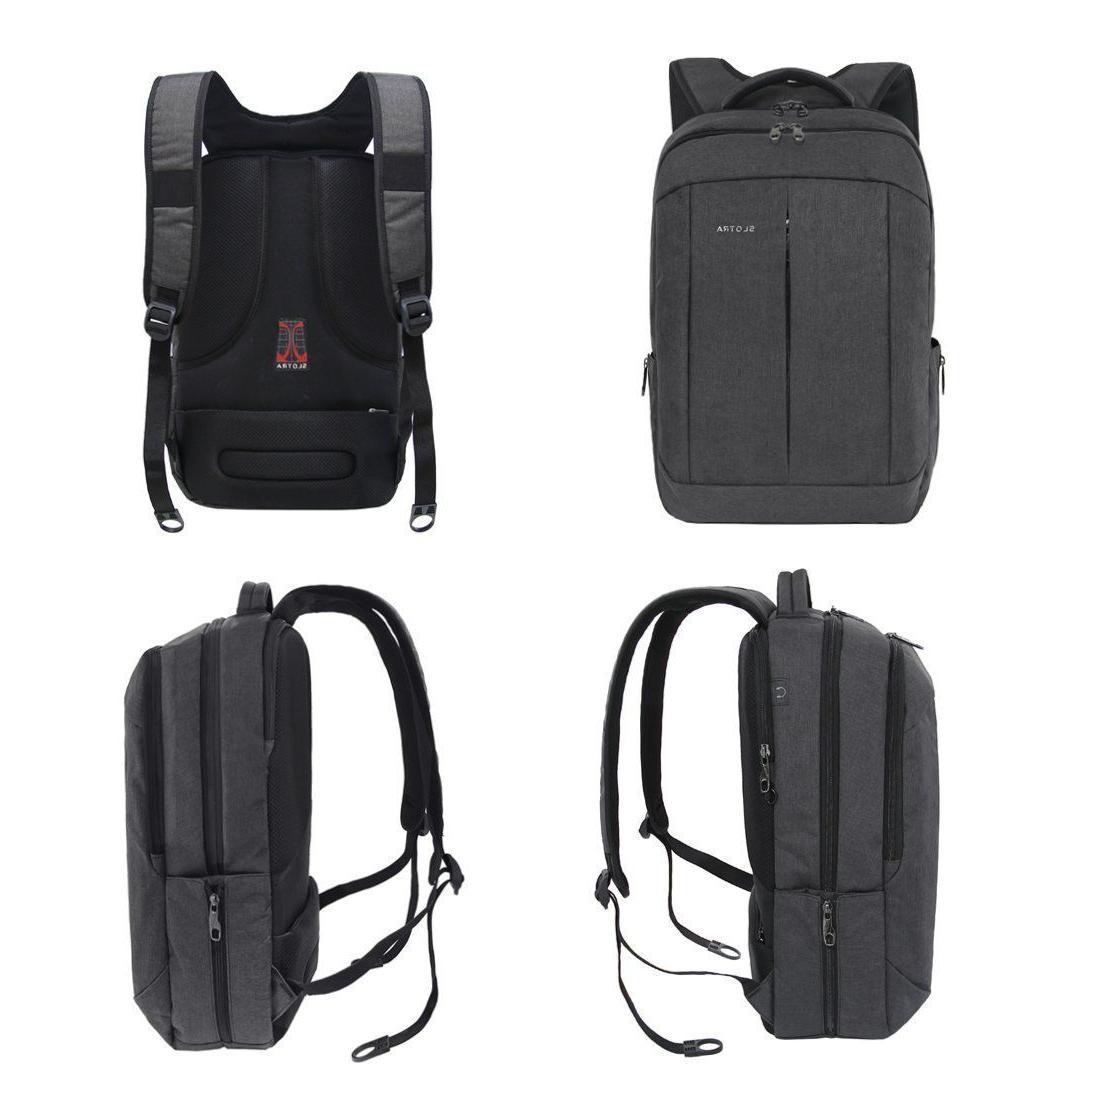 17 Business Travel Bag Gray